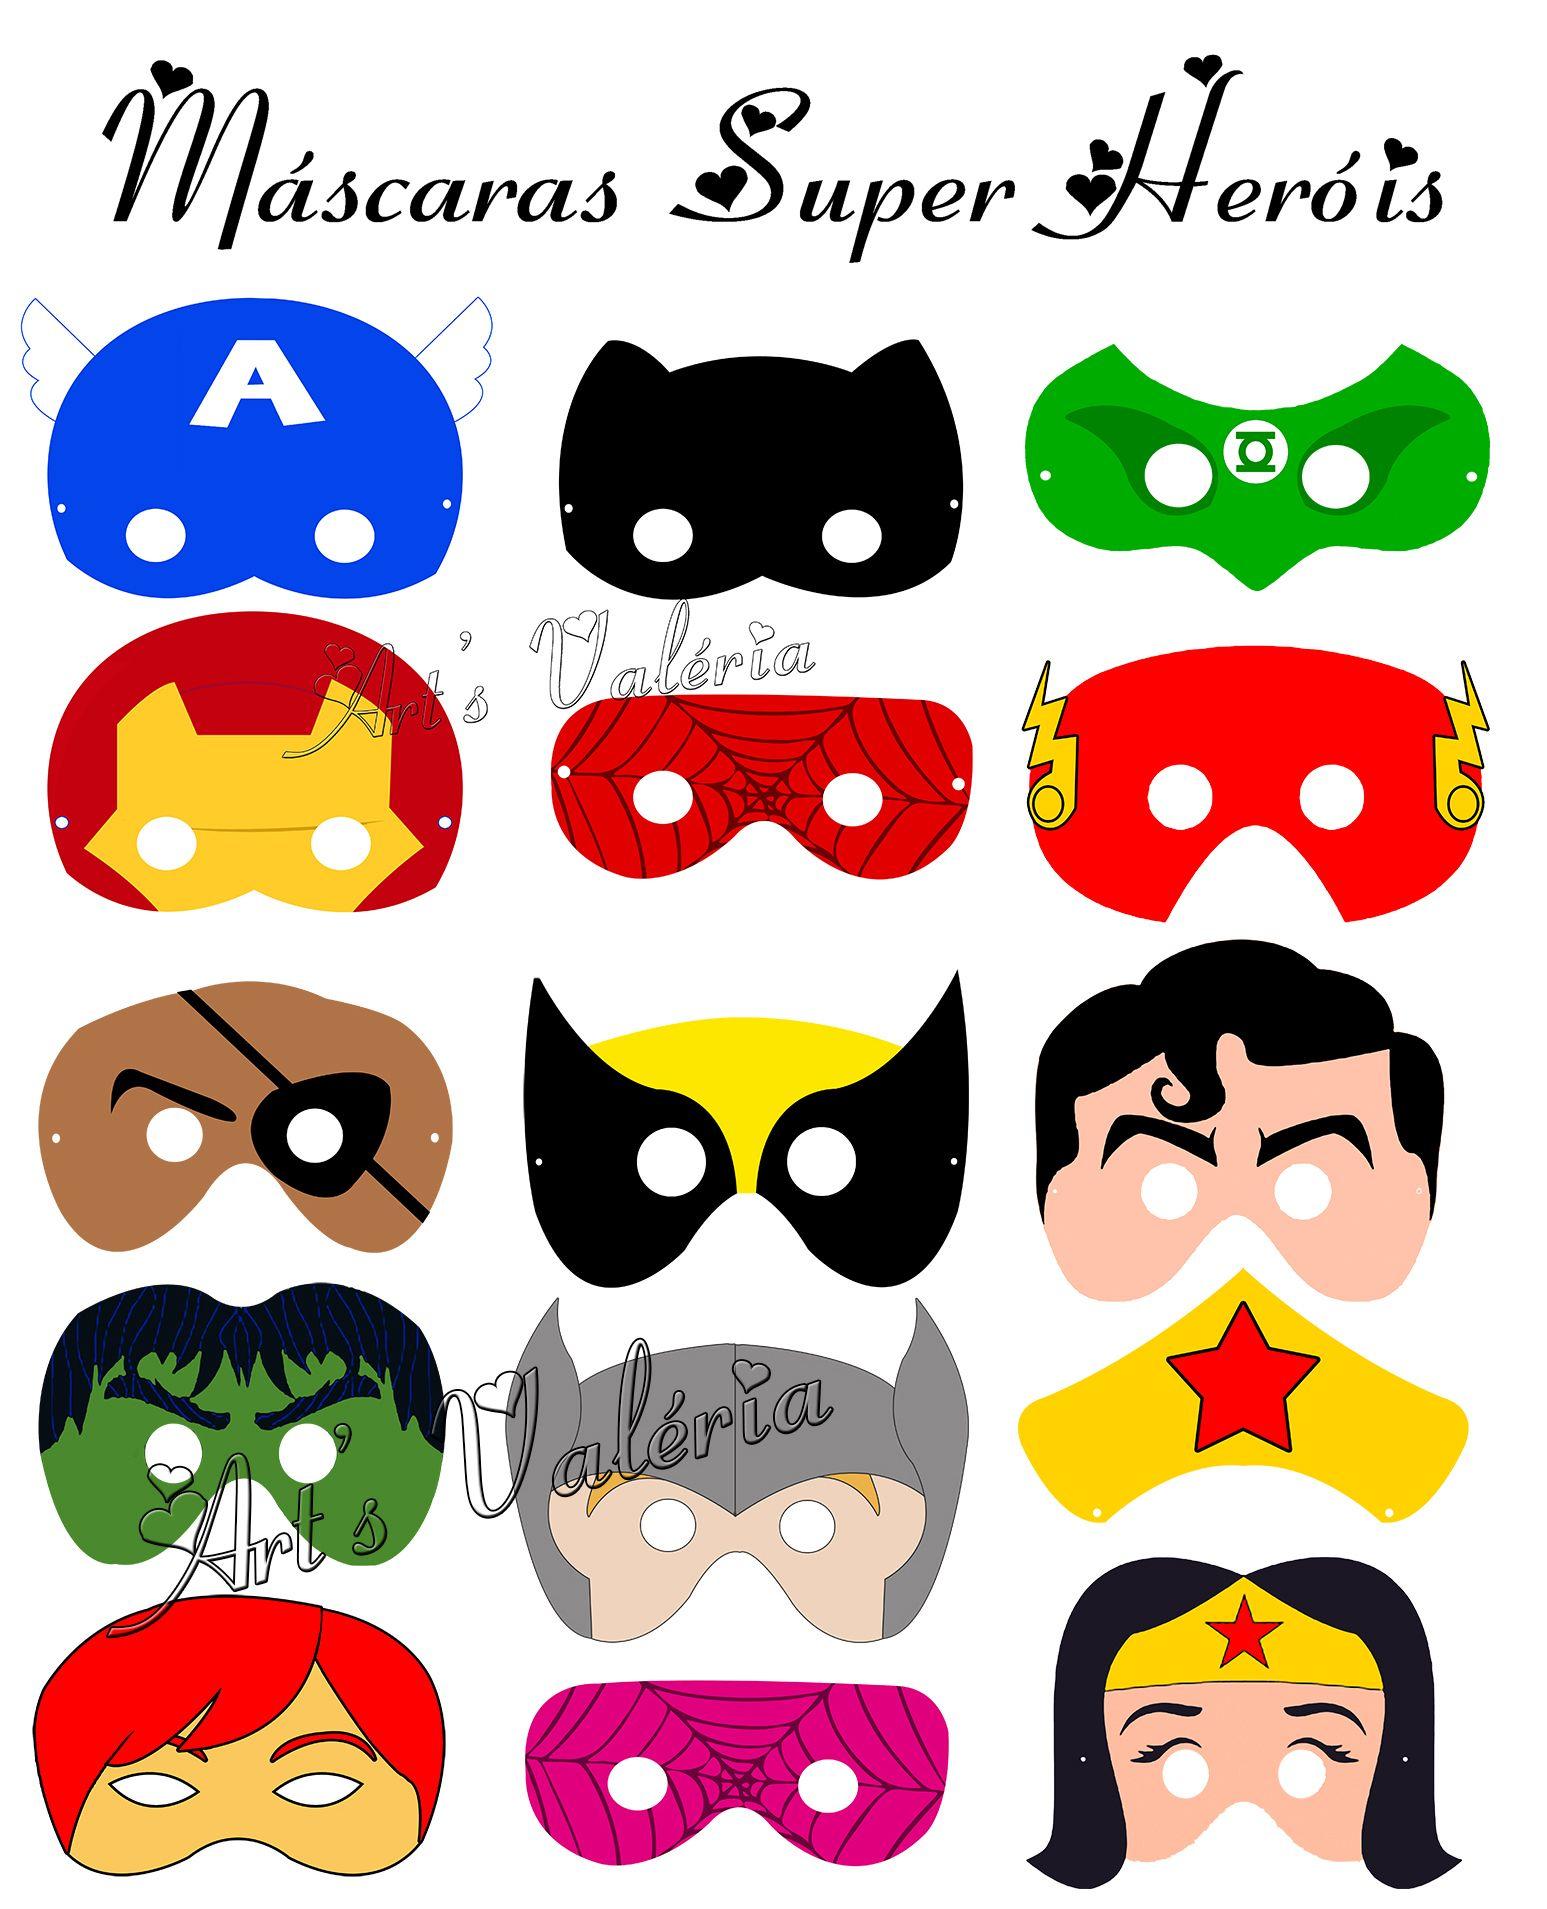 mascaras super herois para imprimir - Pesquisa Google | Niver Kauã ...